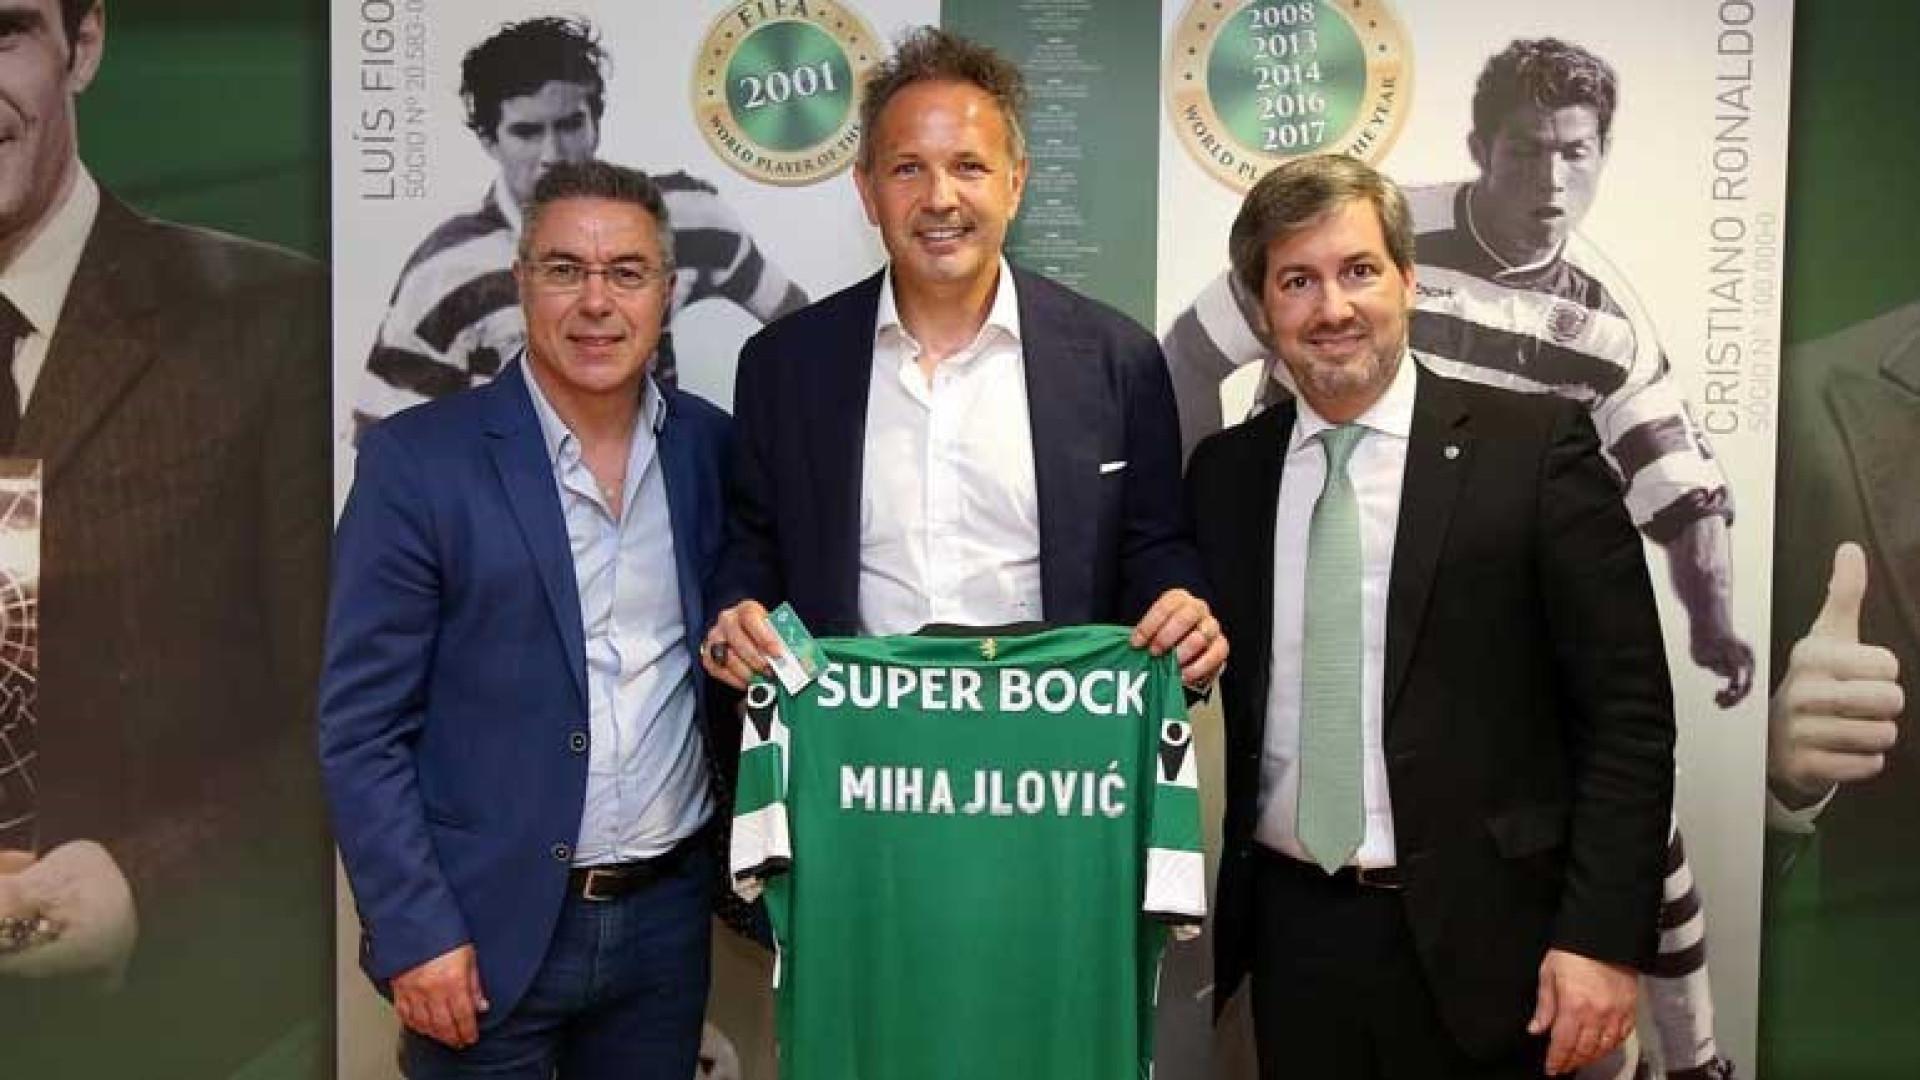 Sinisa Mihajlovic confirmado como treinador do Sporting